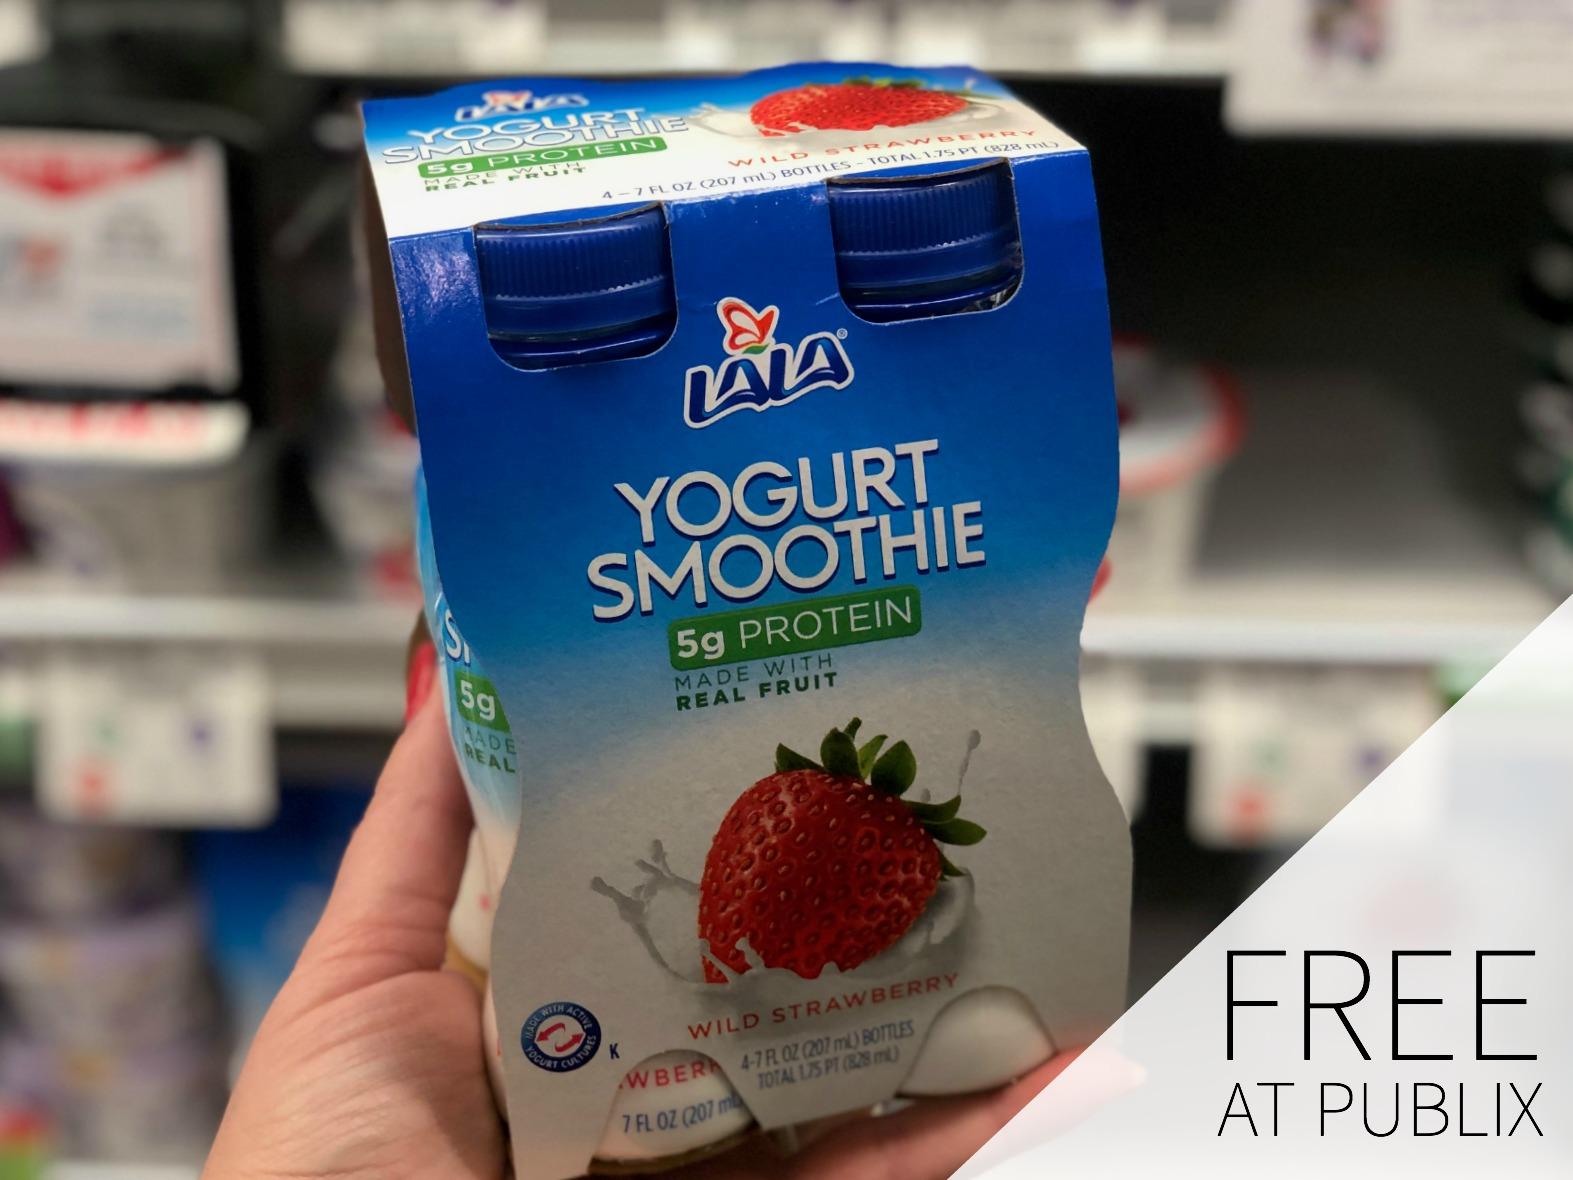 FREE LALA Yogurt Smoothie 4-Pack At Publix on I Heart Publix